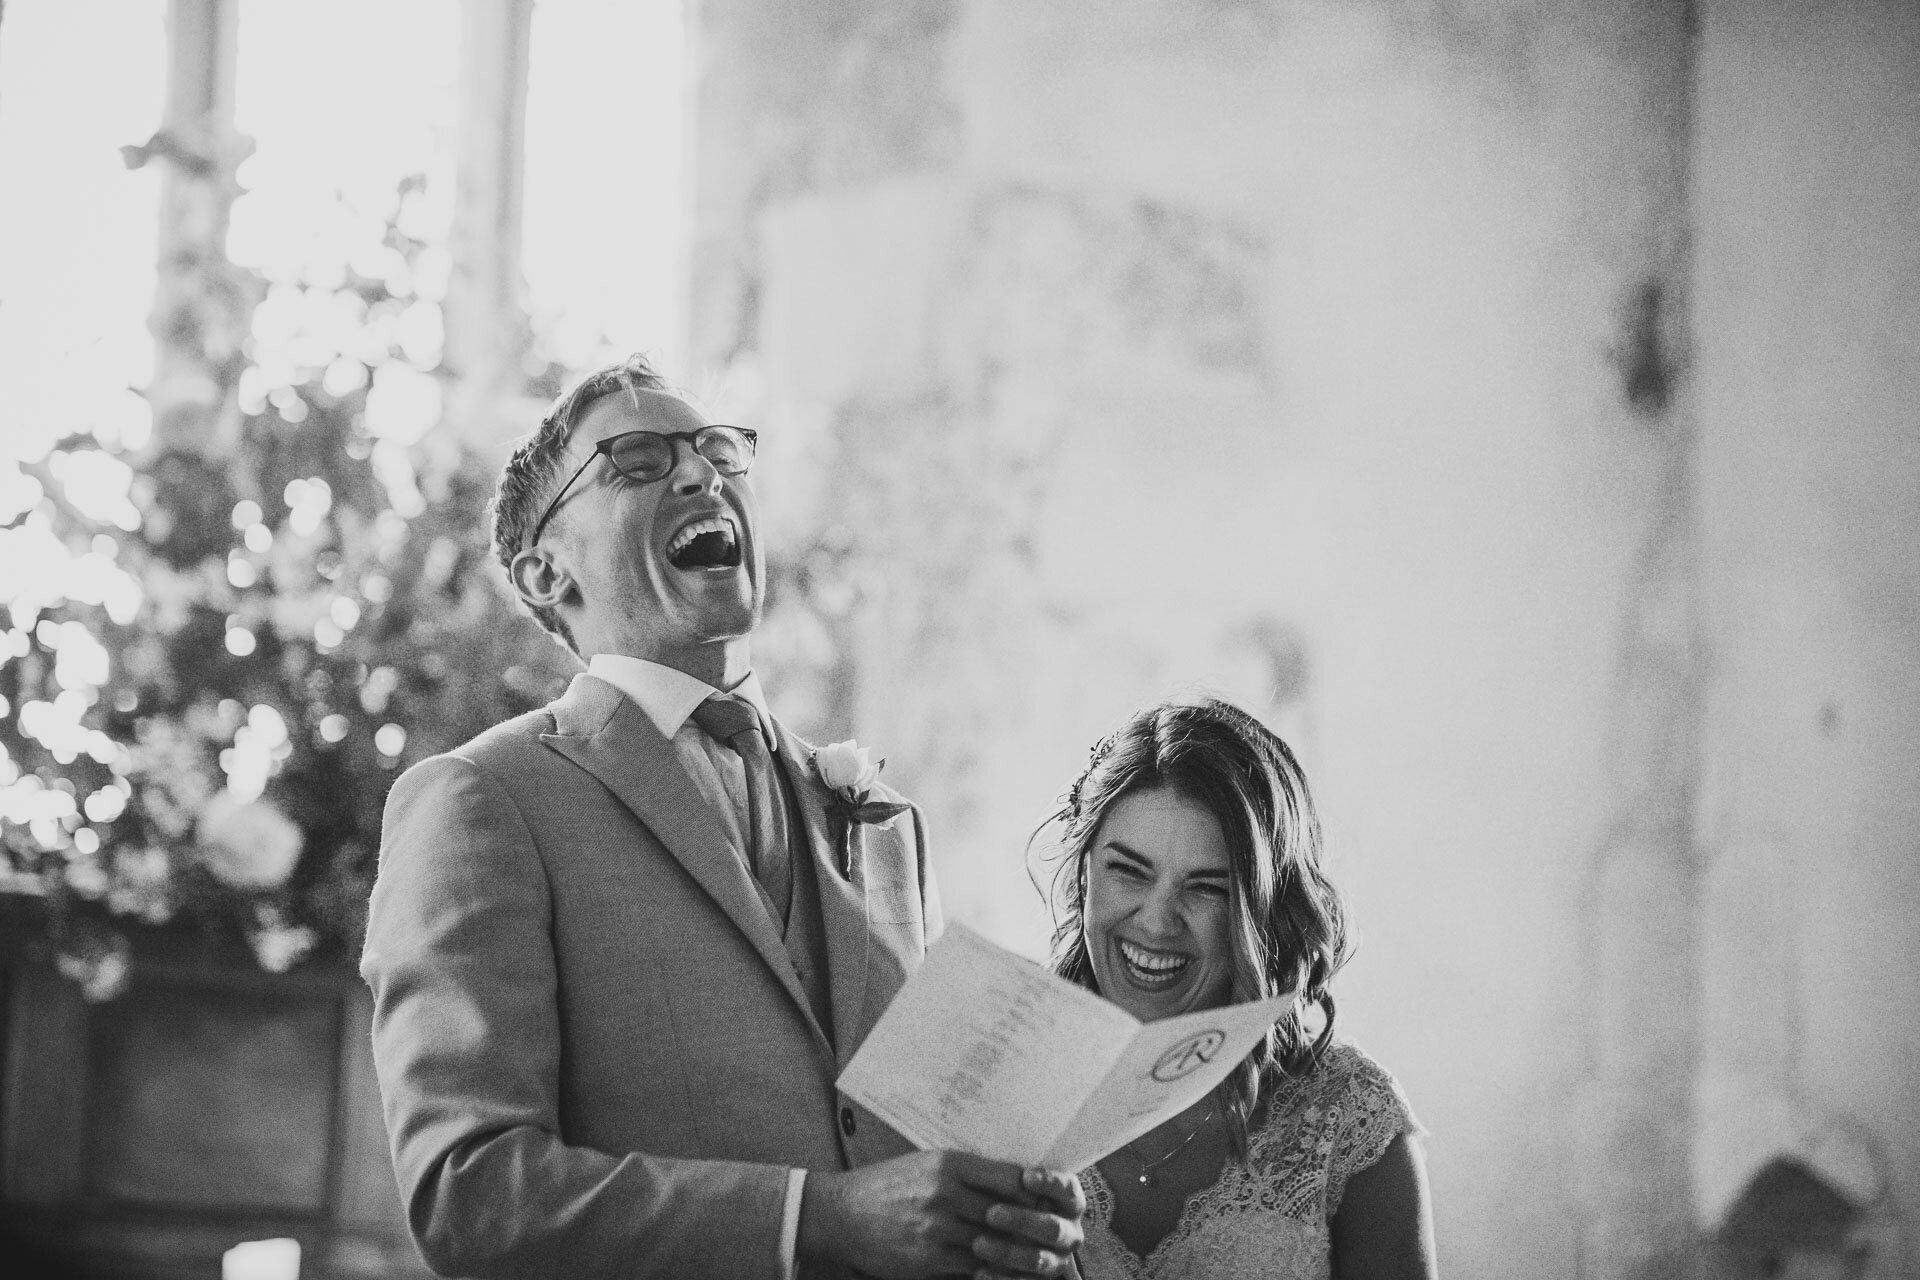 dorset_wedding_photographer-43.jpg